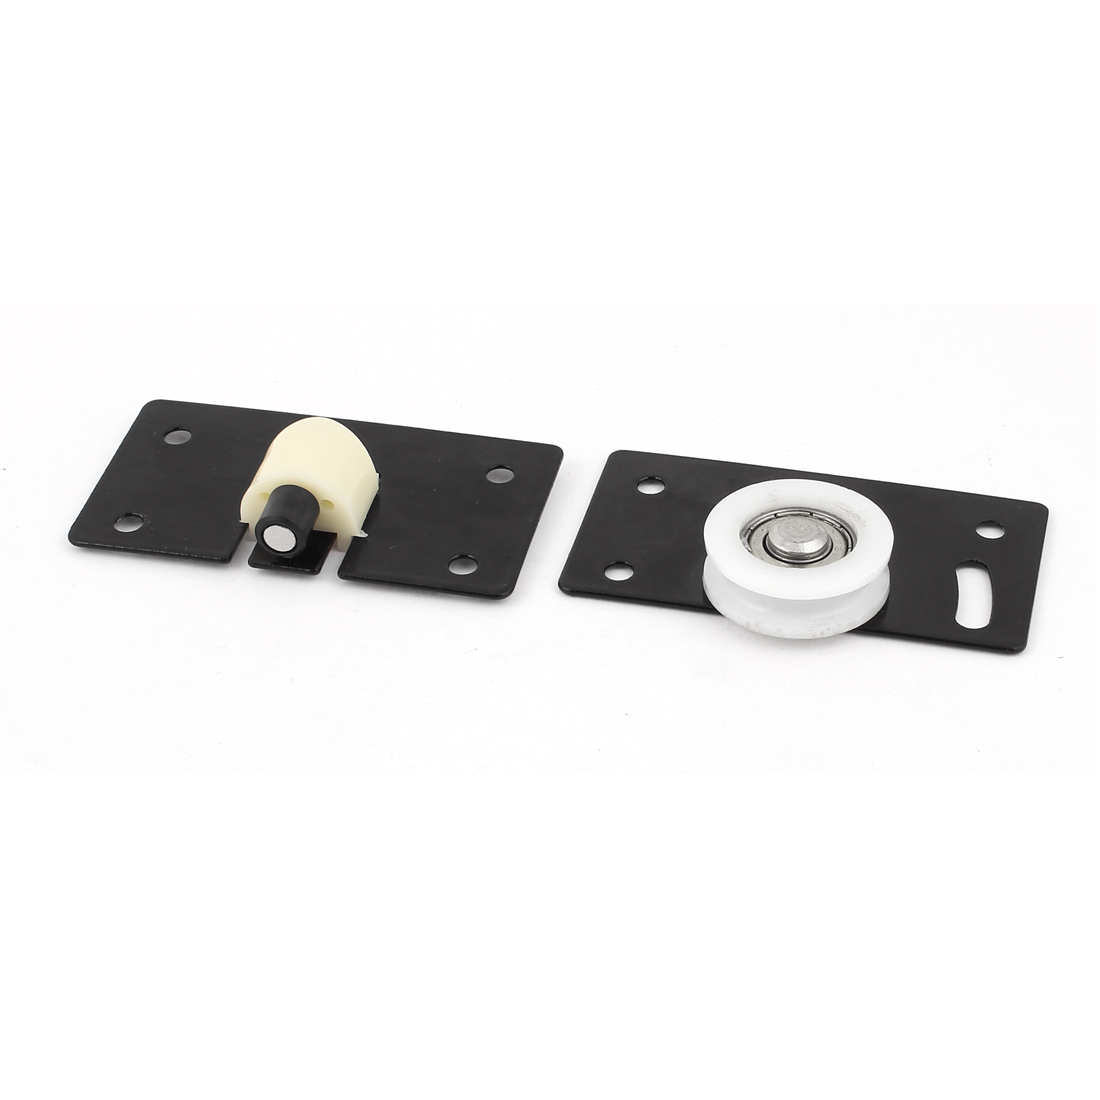 2 Pcs Rectangular Metal Plate Sliding Door Roller Black 33mm Dia for Wardrobe